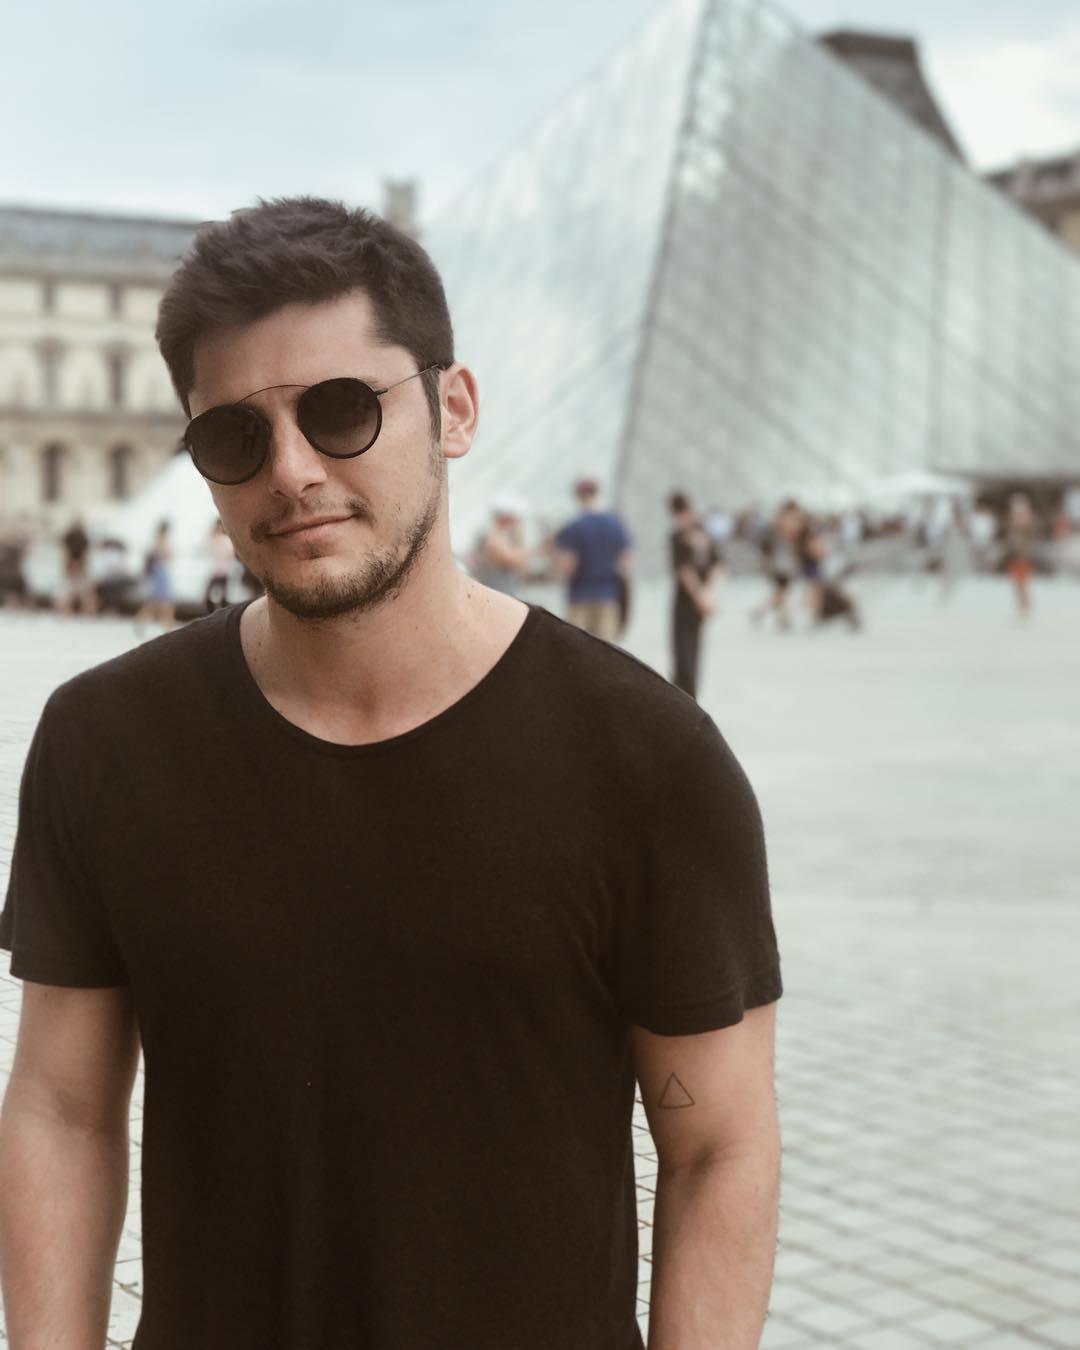 Vaza na internet suposto vídeo íntimo de Bruno Gissoni; ator se pronuncia